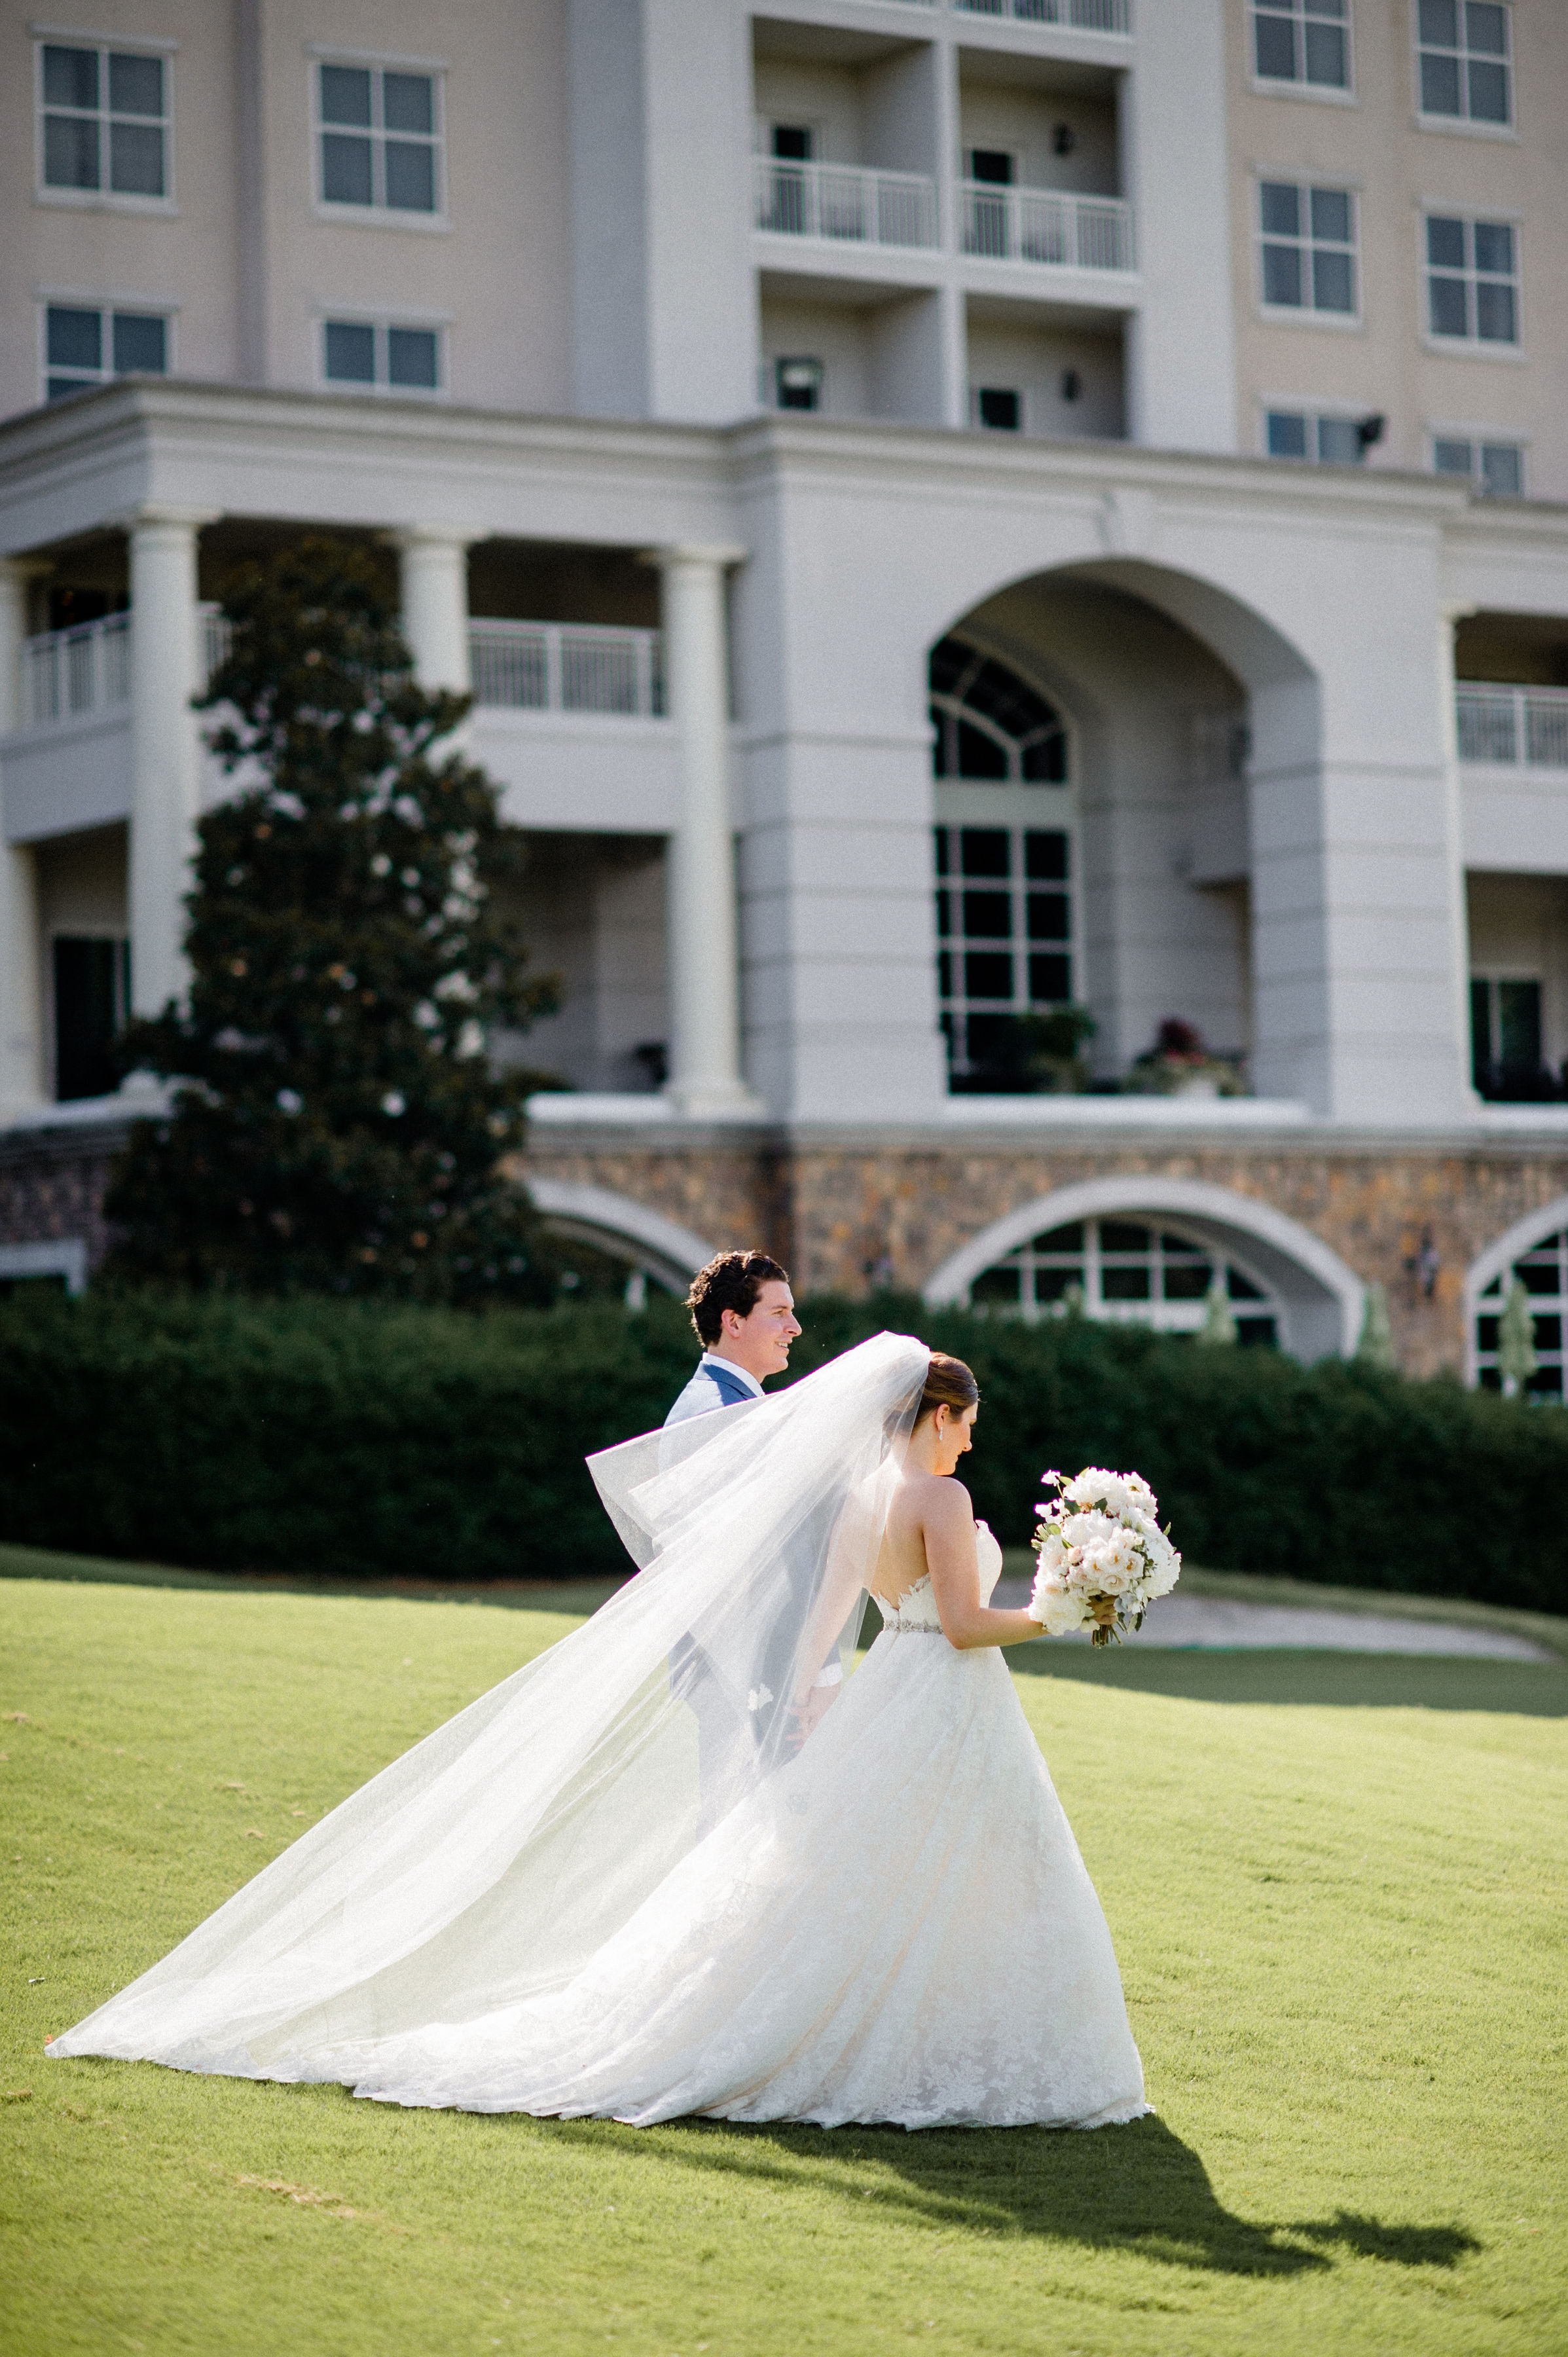 McElravey_Wedding_CarolineLimaPhotography_2018_236.jpg